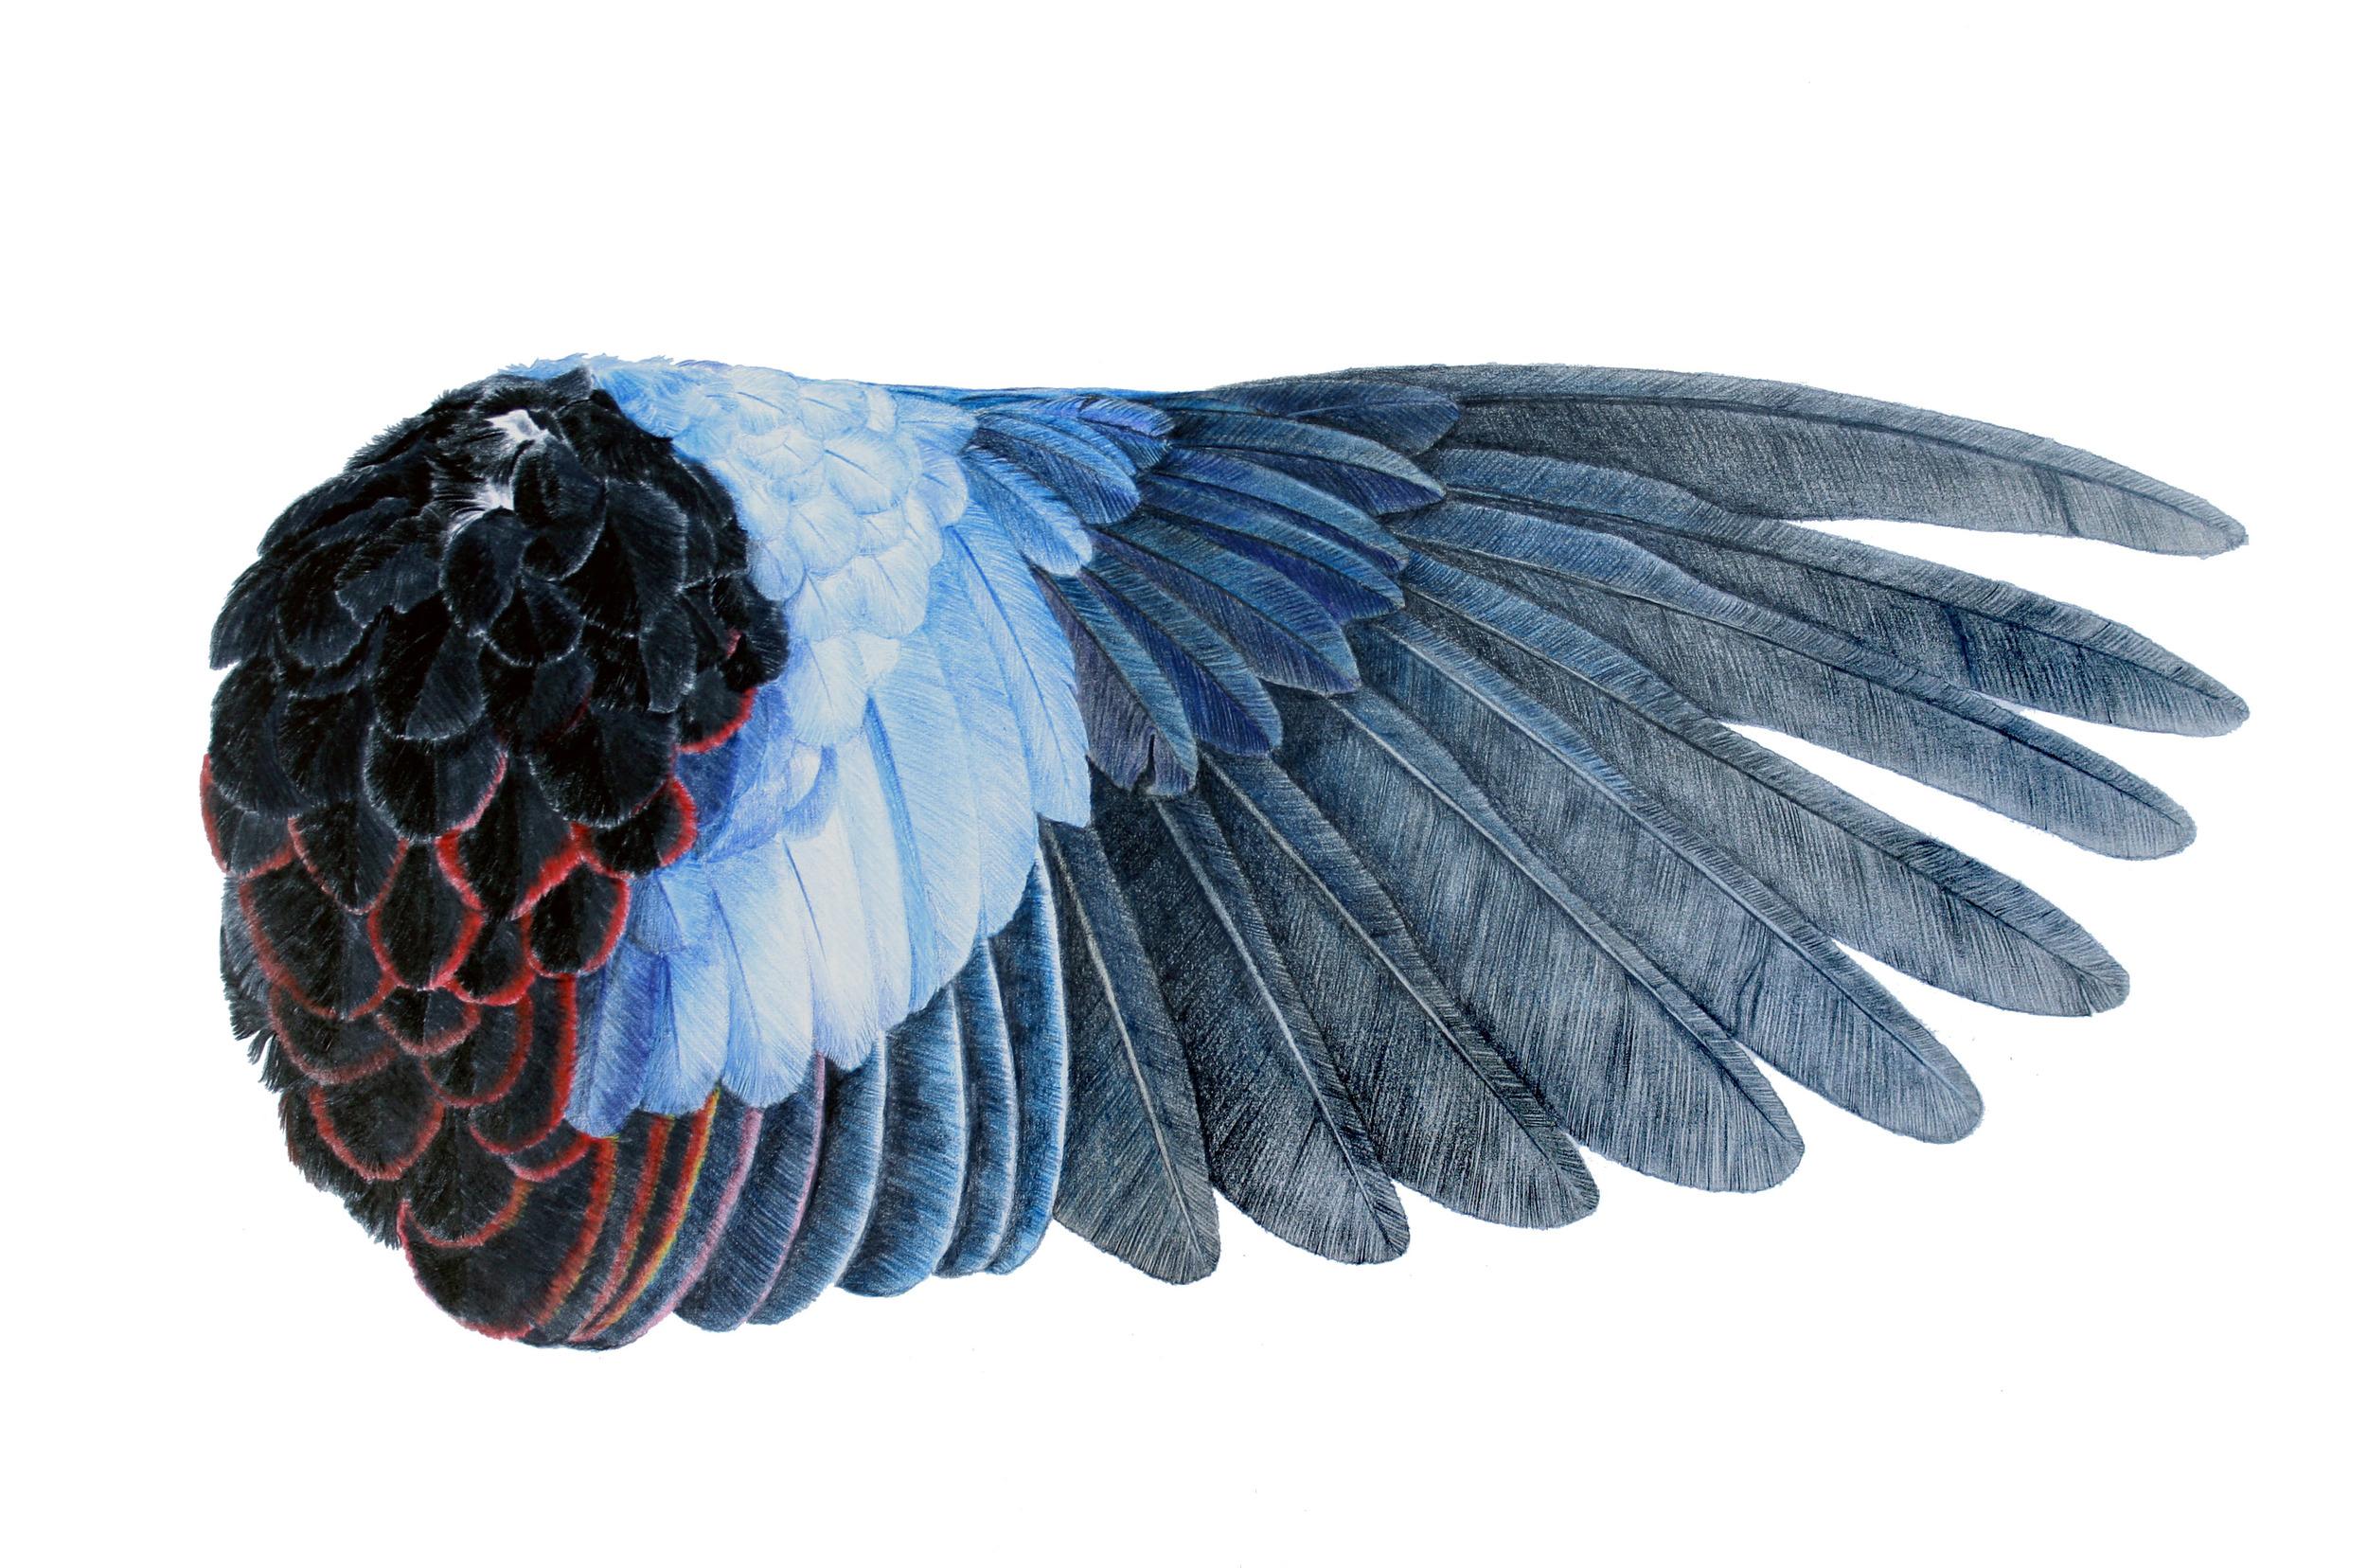 'Rosella Wing'